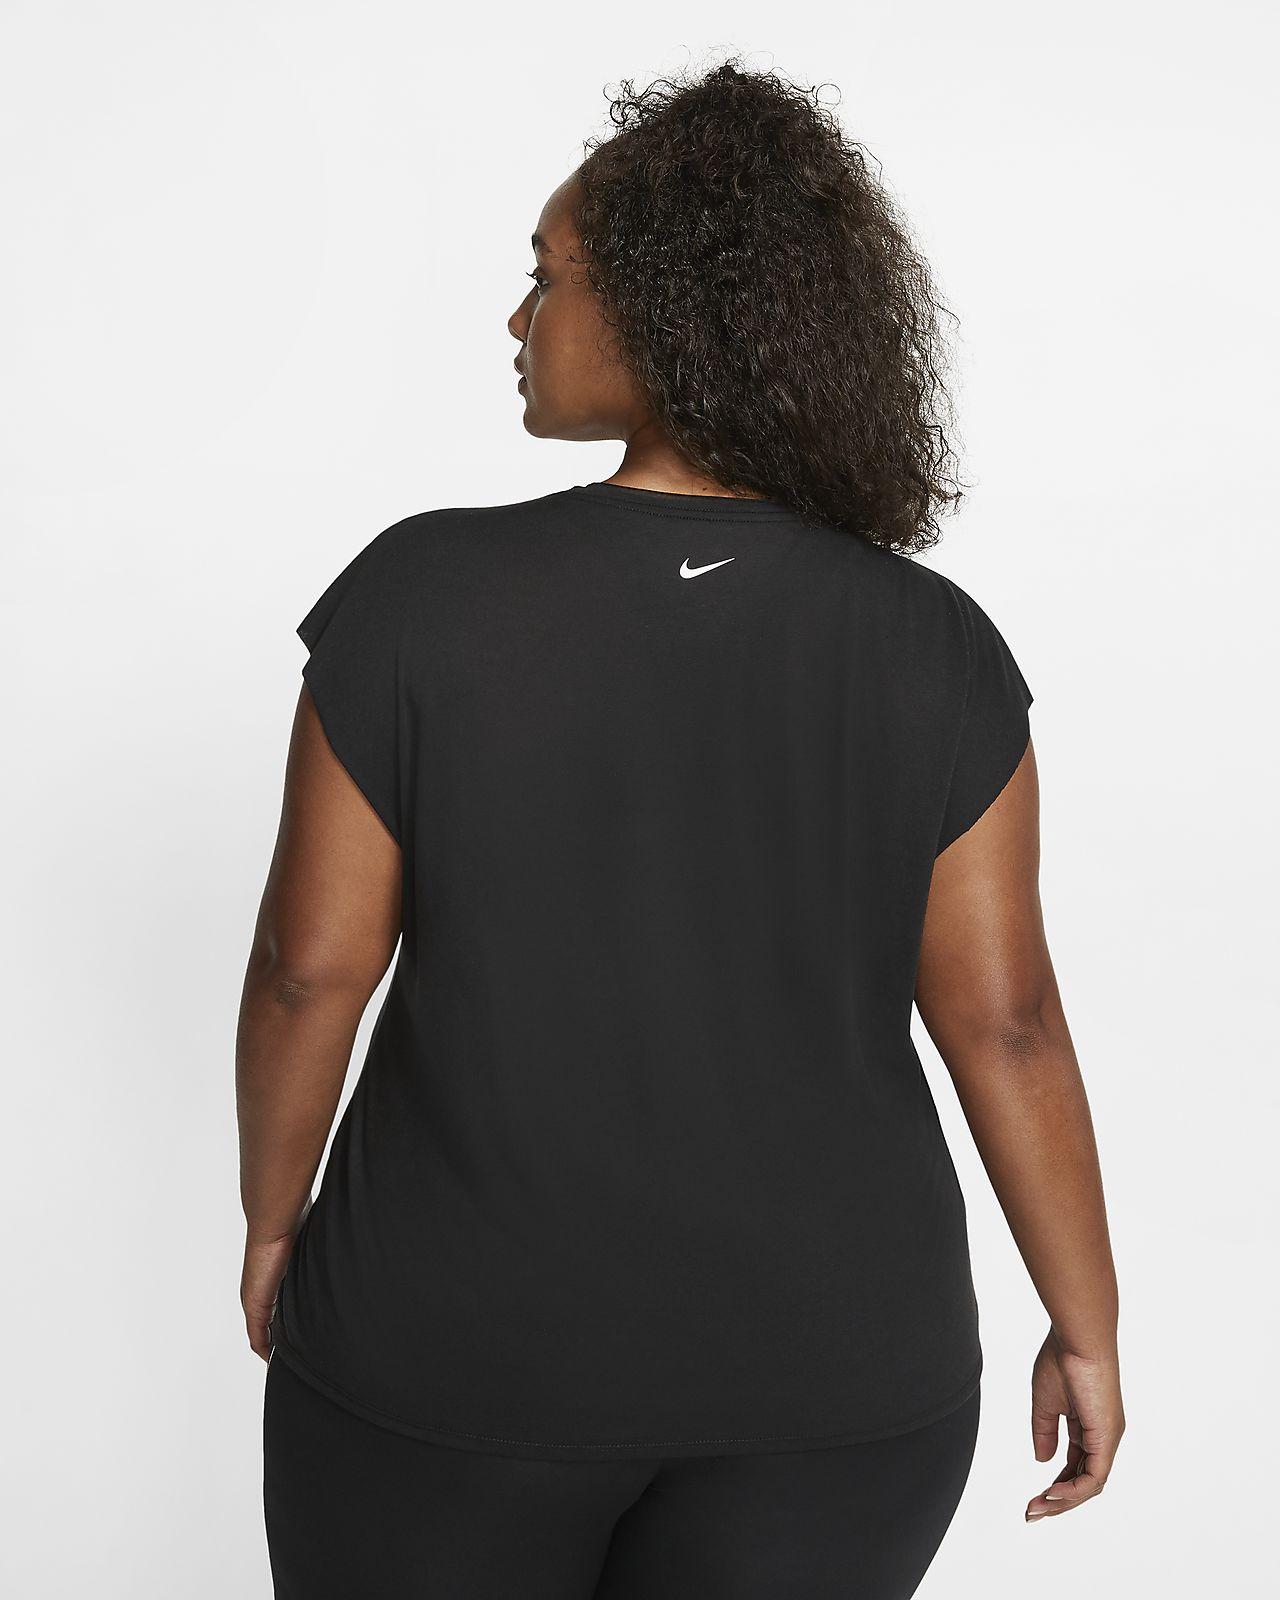 Nike Dri FIT kurzarm Trainingsoberteil mit Grafik für Damen (große Größe)